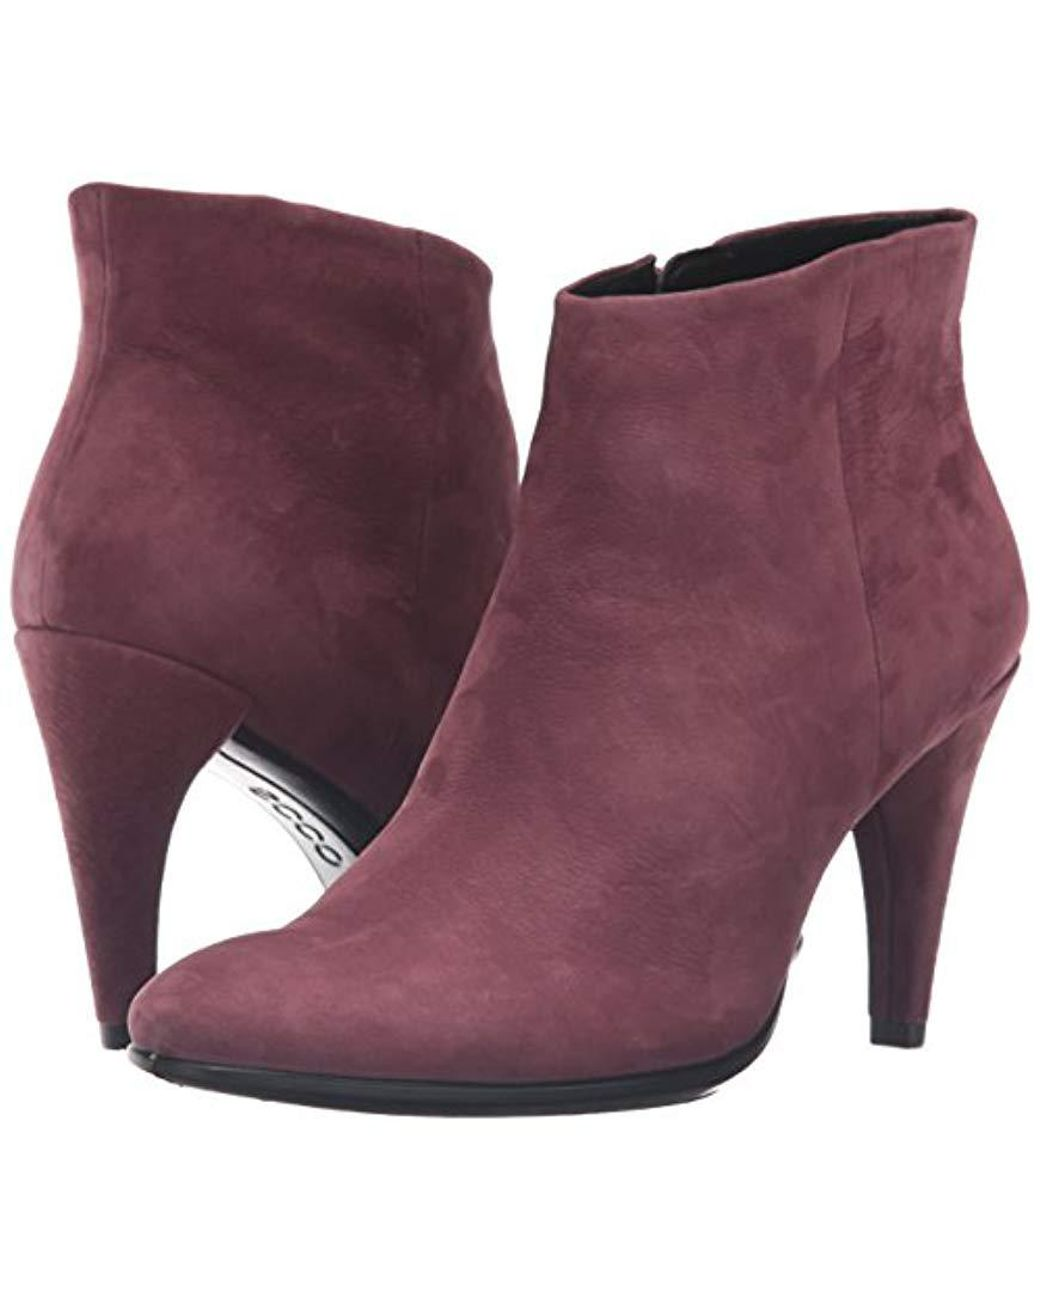 94f1066dfeaa2 Ecco Shape 75 Sleek Ankle Boot in Purple - Save 50% - Lyst